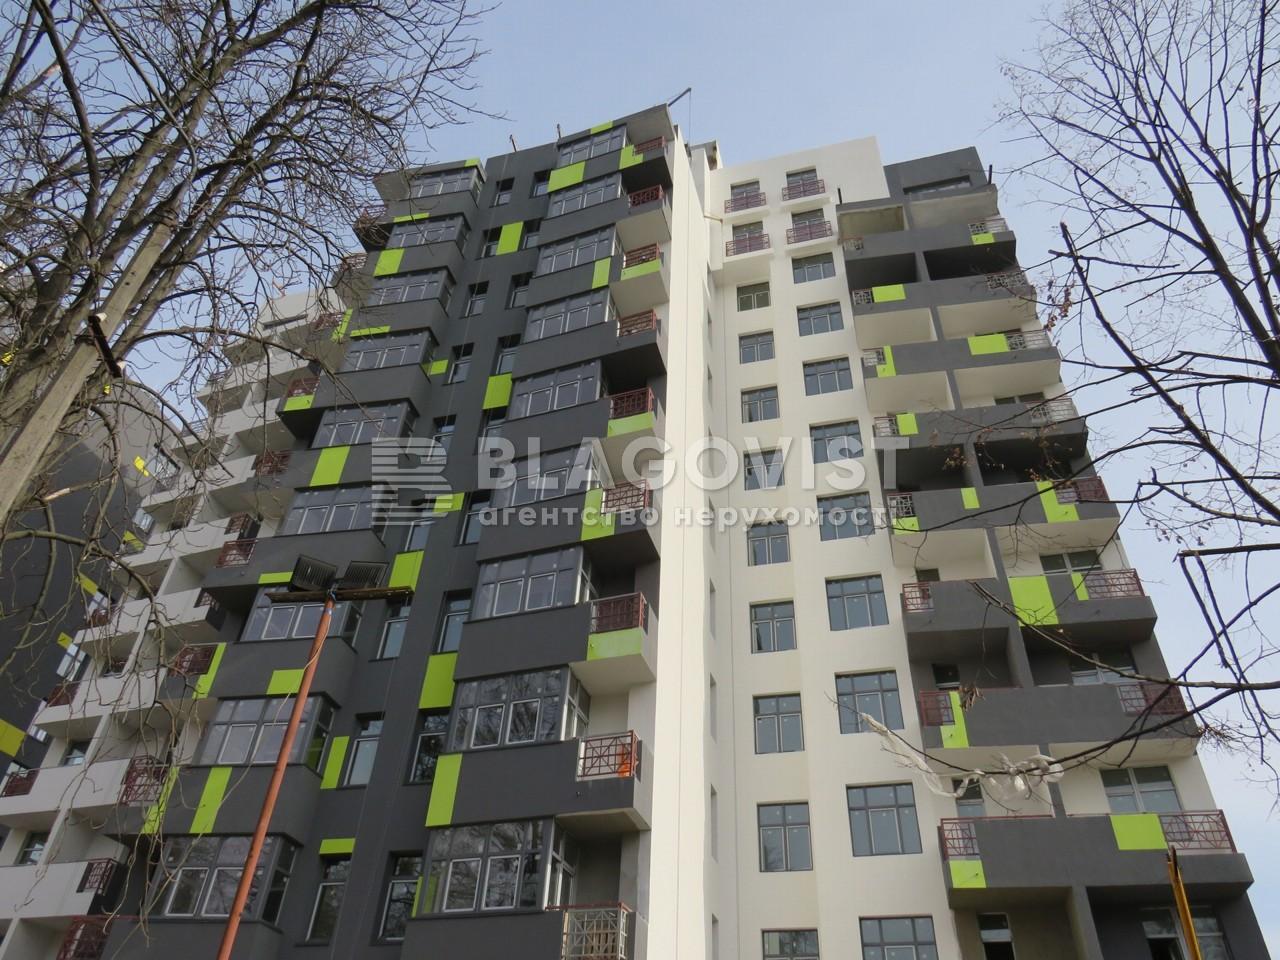 Квартира A-111343, Багговутовская, 1г, Киев - Фото 1